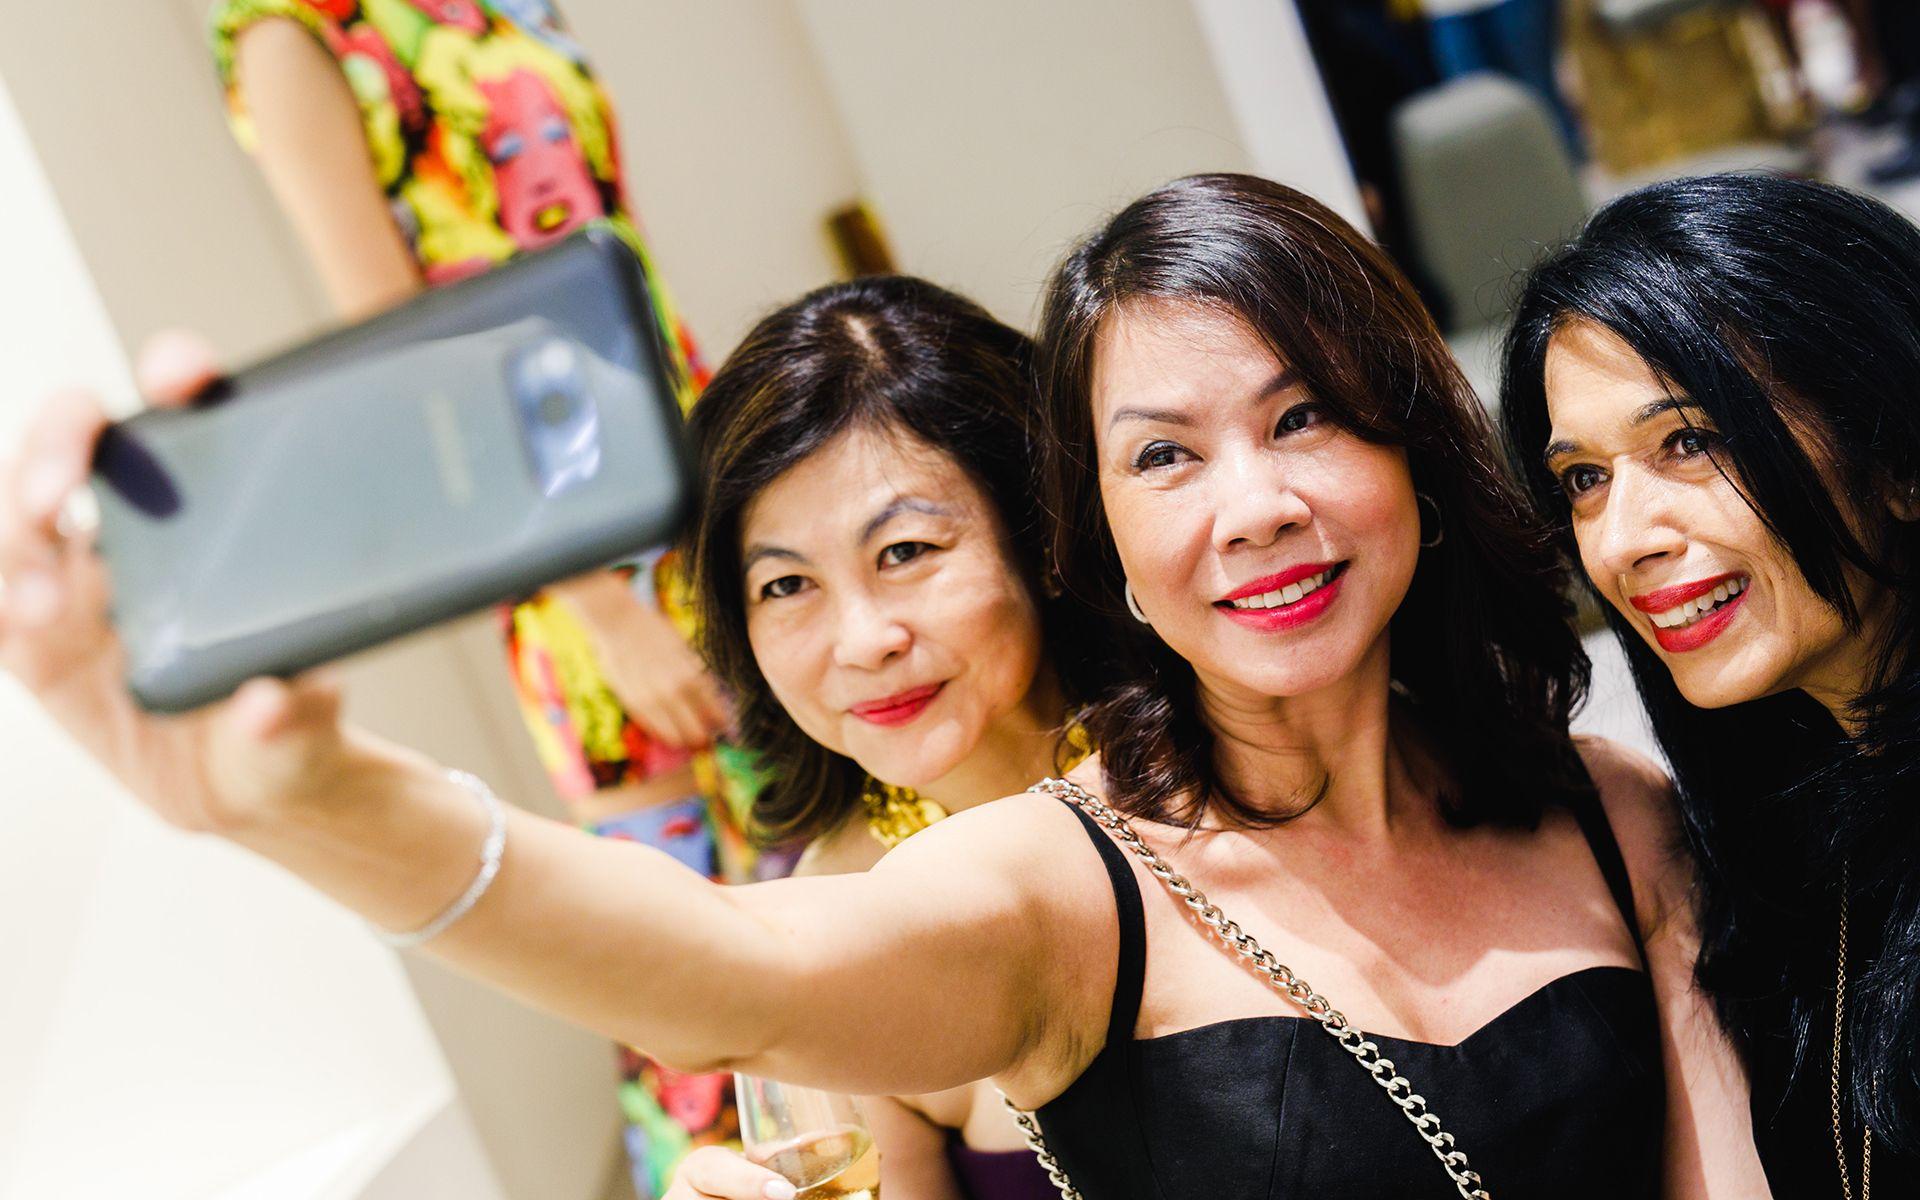 Chan Yue Yee, Yenti Lou and Datin Angie Abdullah